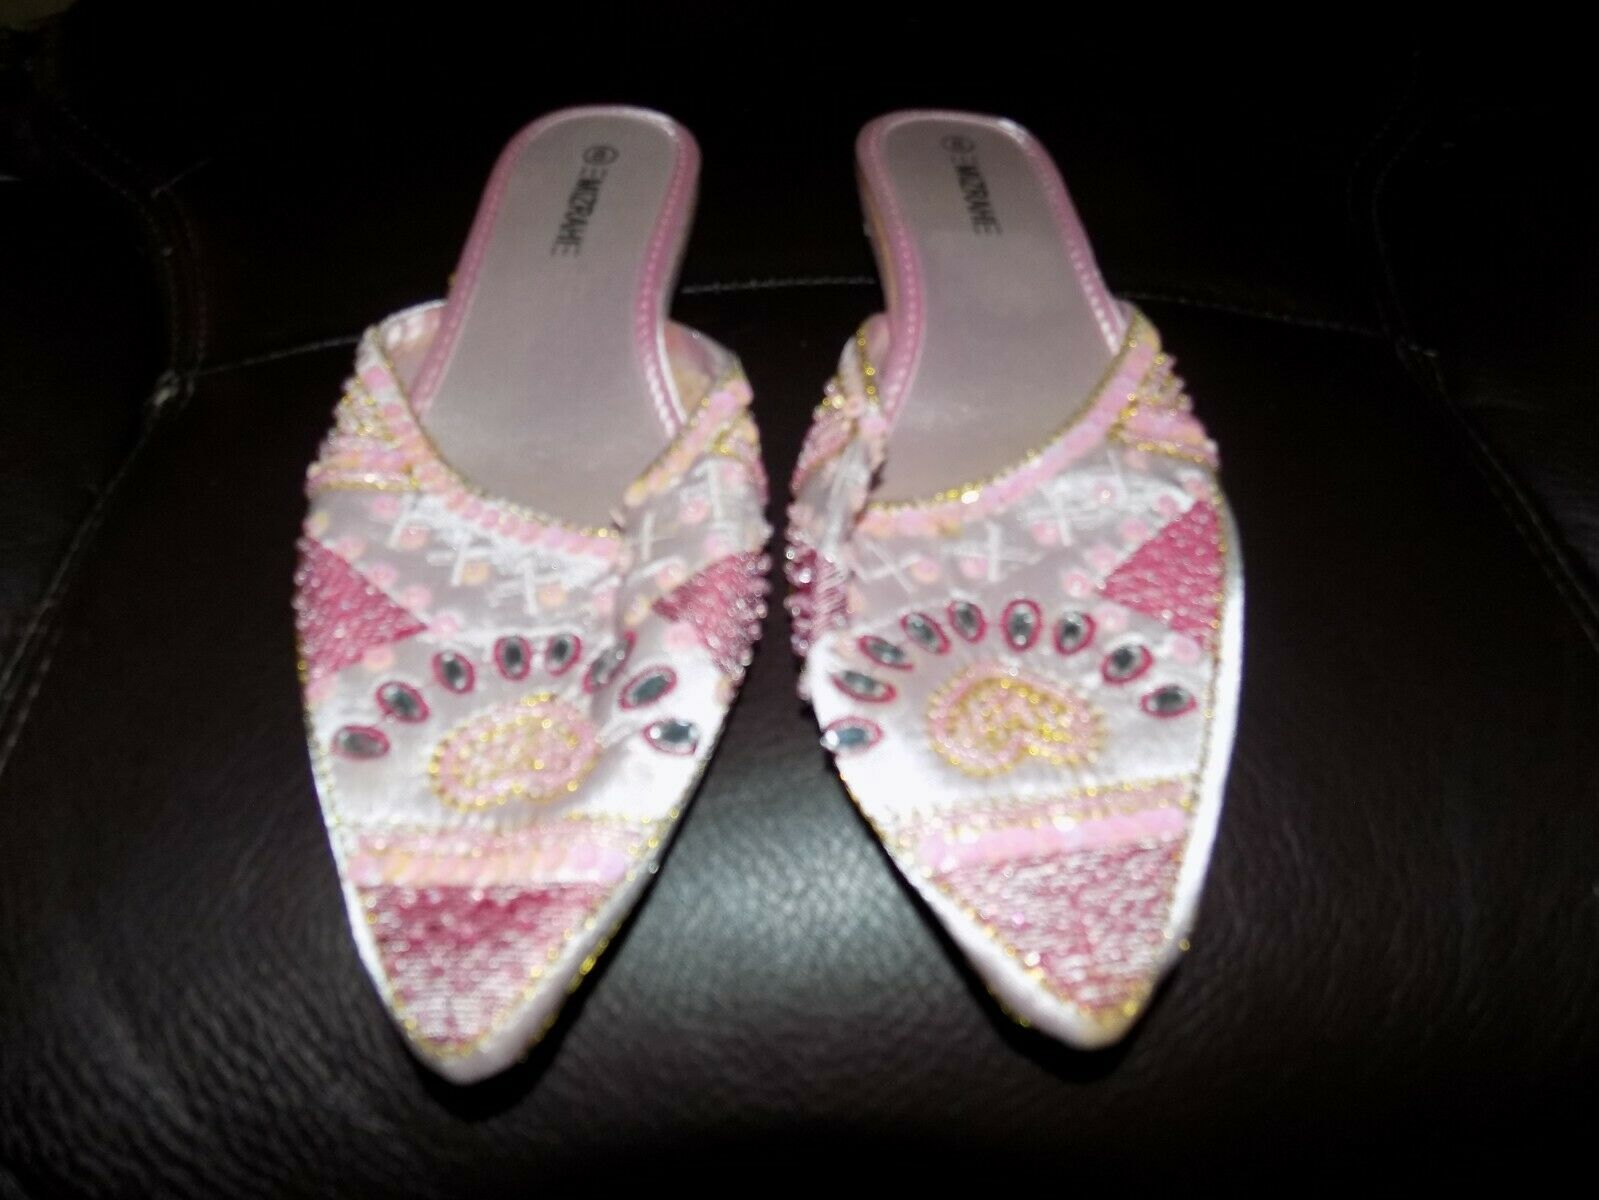 Isaac Mizrahi Pink Rhinestone Slippers Size 8 Women's EUC - $20.24